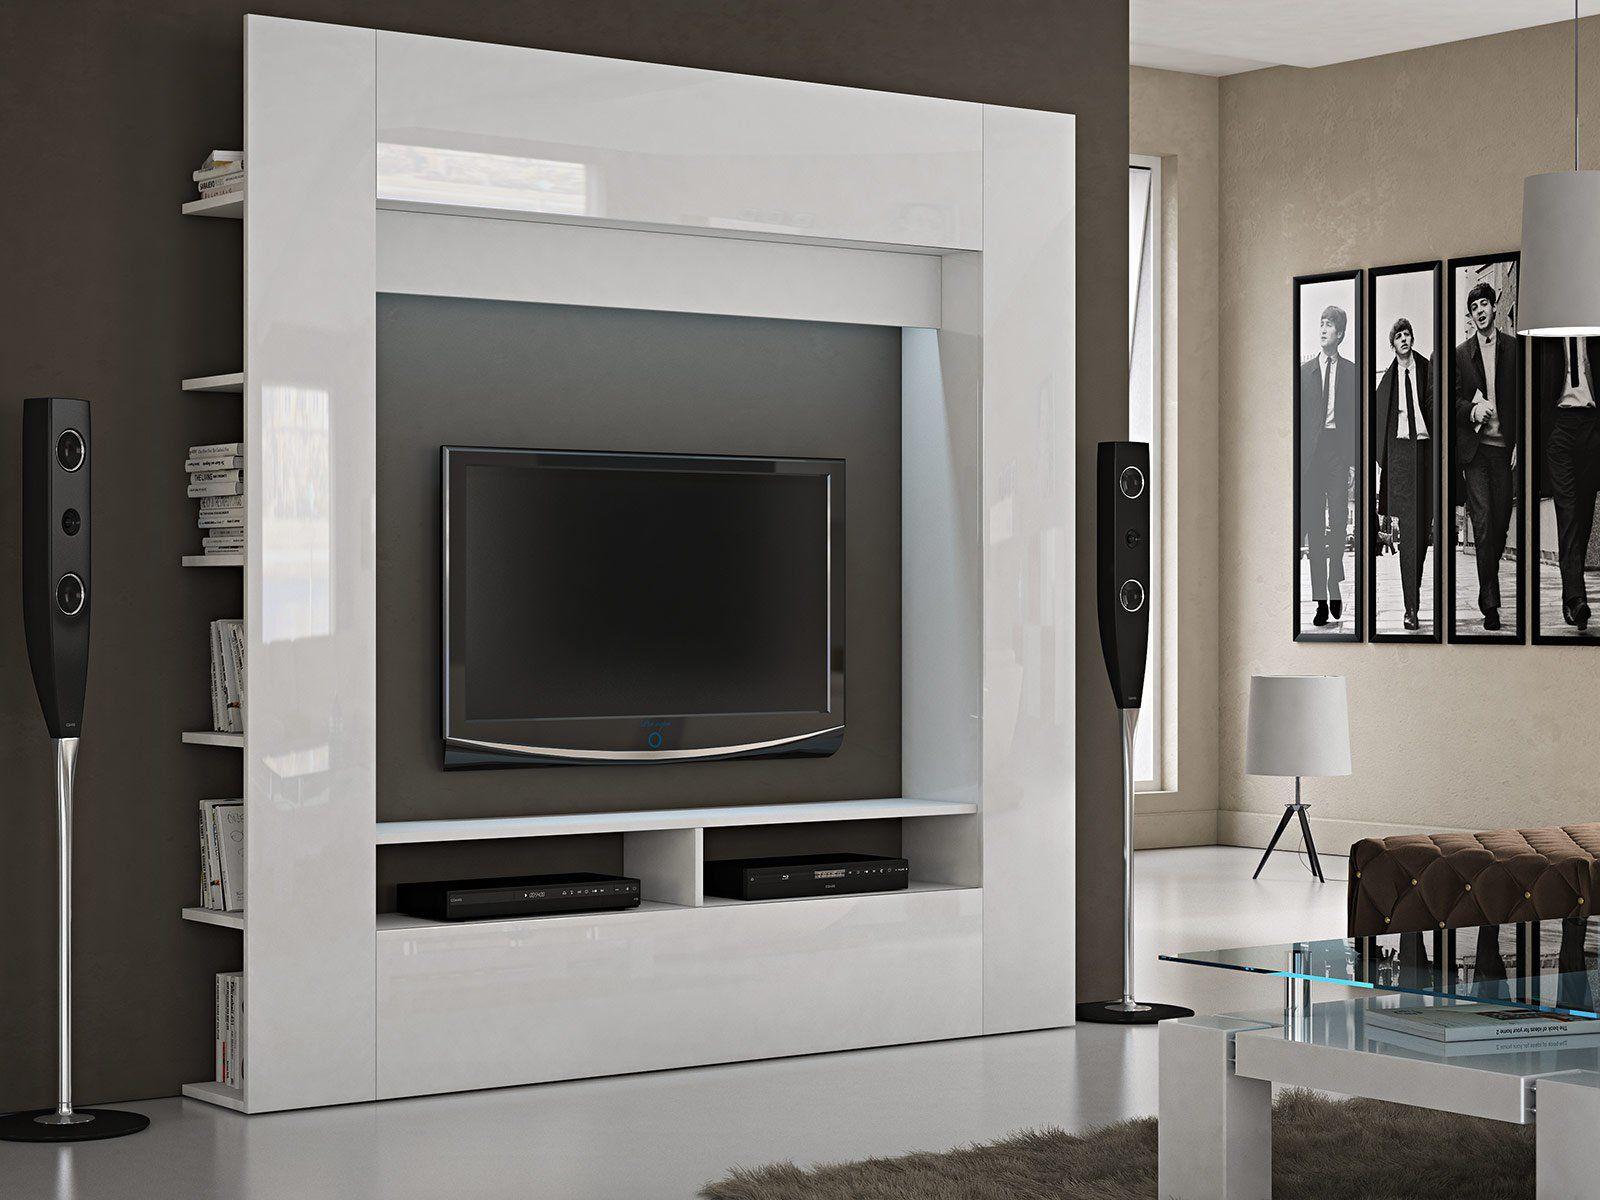 Labi Möbel TV Wand Medienwand Syla: Amazon.de: Küche & Haushalt ...